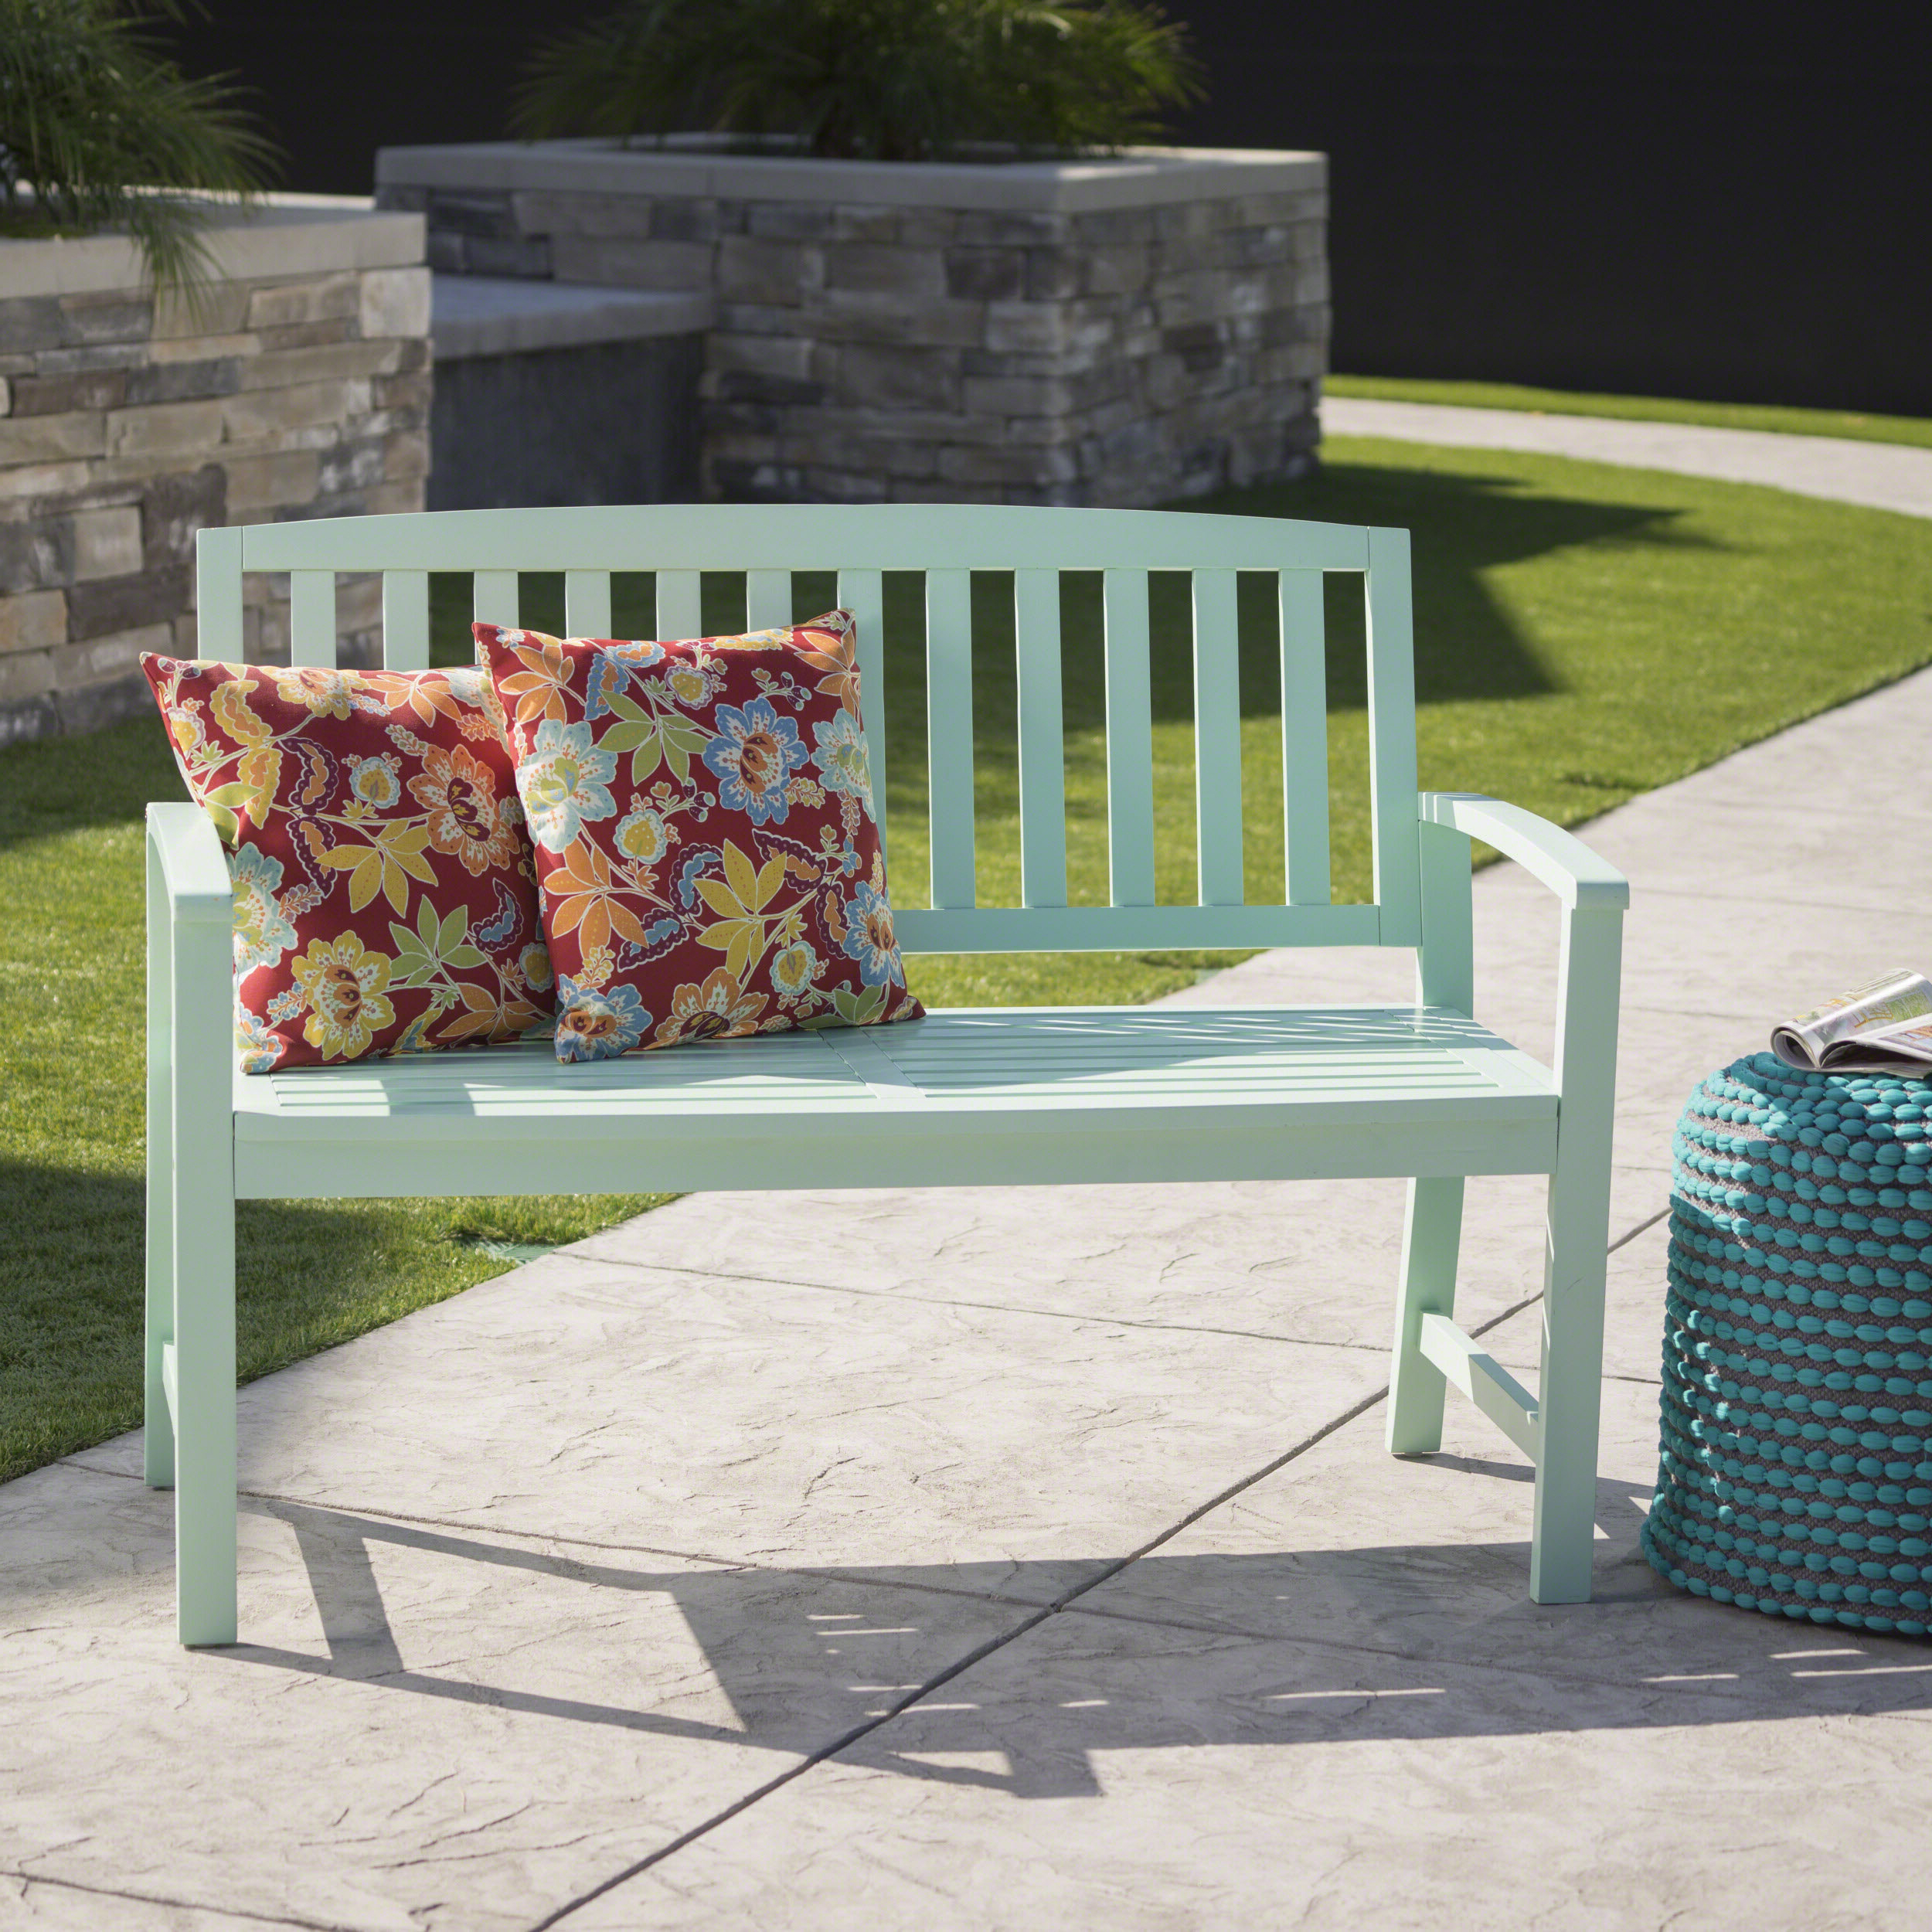 Leora Wooden Garden Bench With Regard To 2019 Avoca Wood Garden Benches (View 10 of 30)